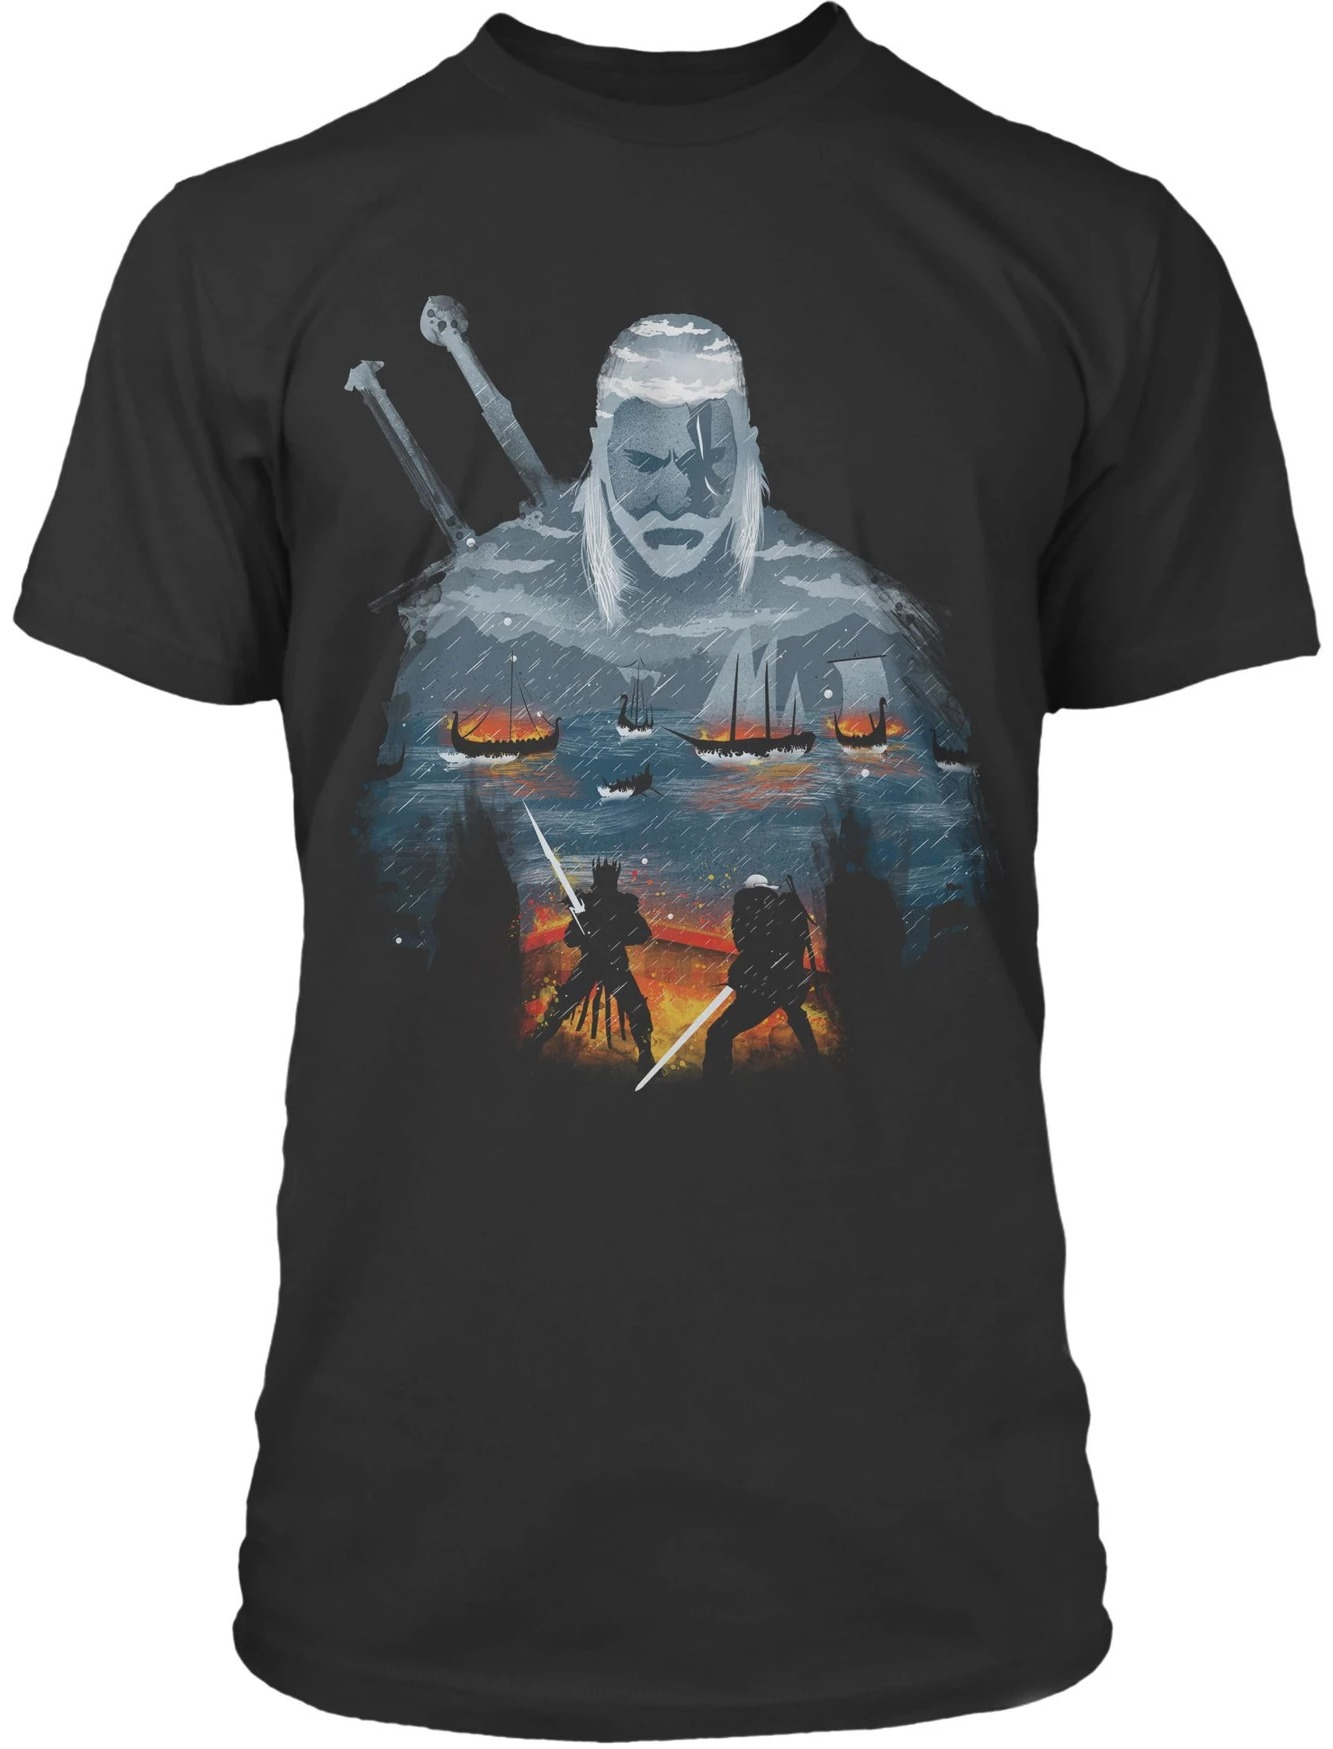 Tričko Zaklínač - Geralt and Eredin (americká vel. XL / evropská XXL) (PC)